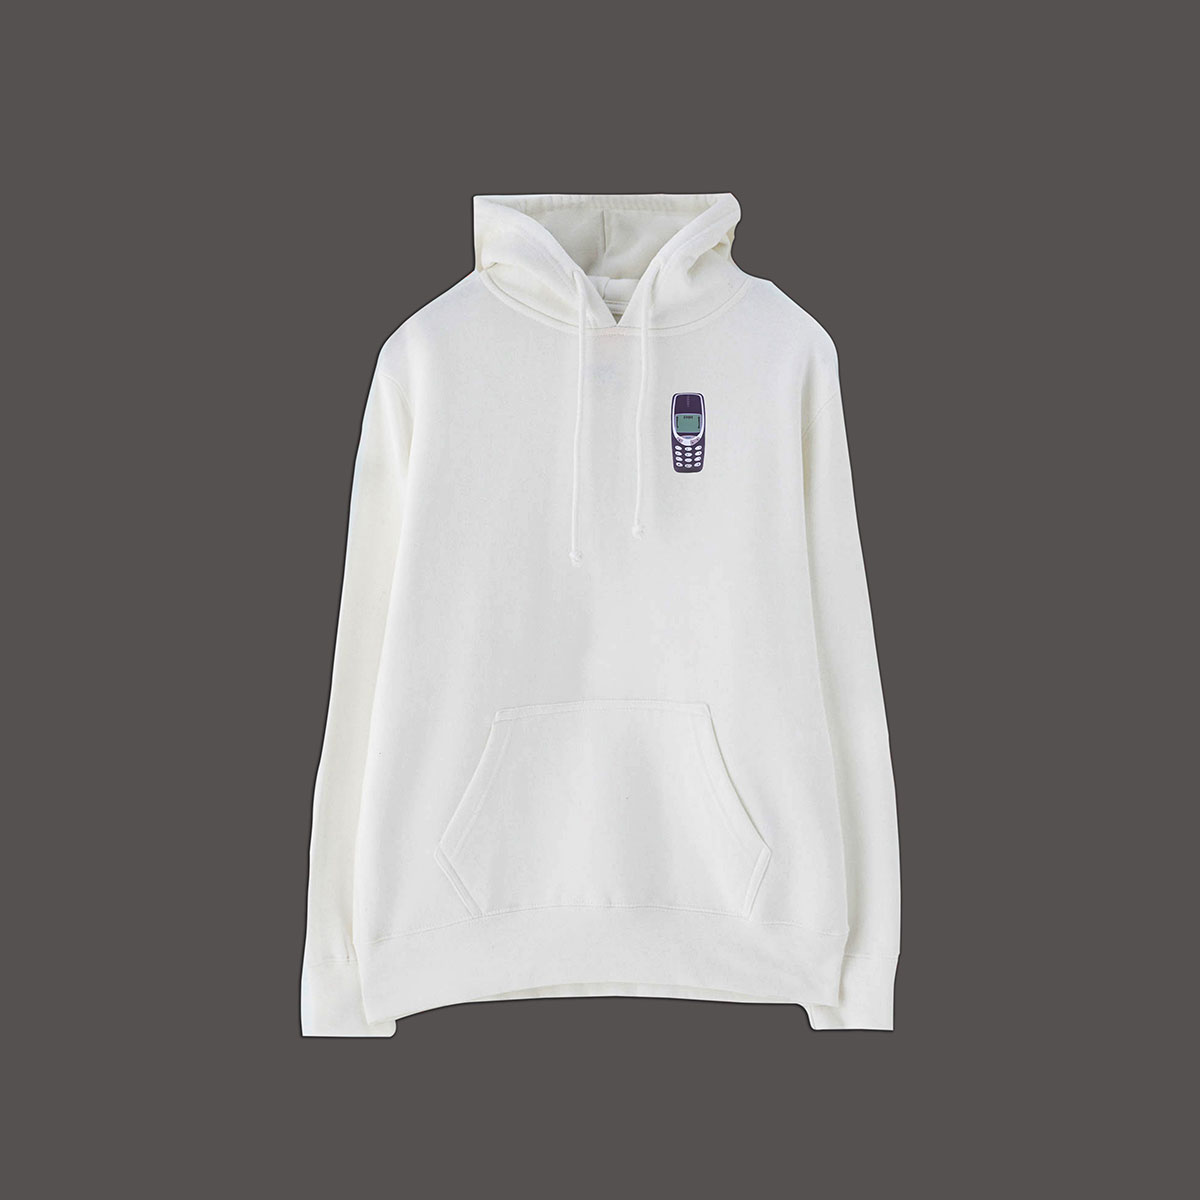 Old School Pullover Hoodie - White